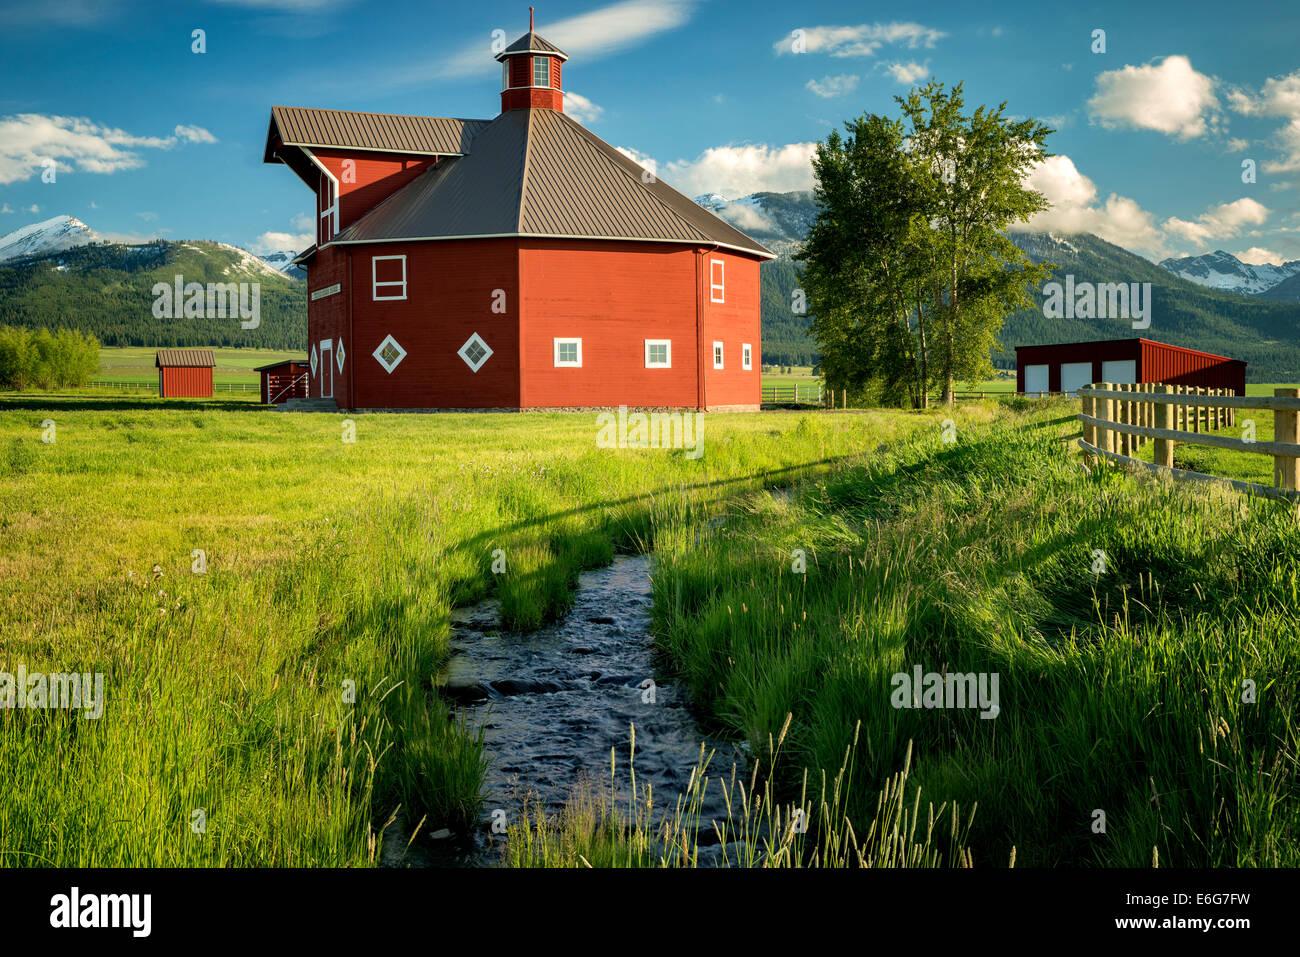 Triple Creek barn and stream. Joseph, Oregon - Stock Image